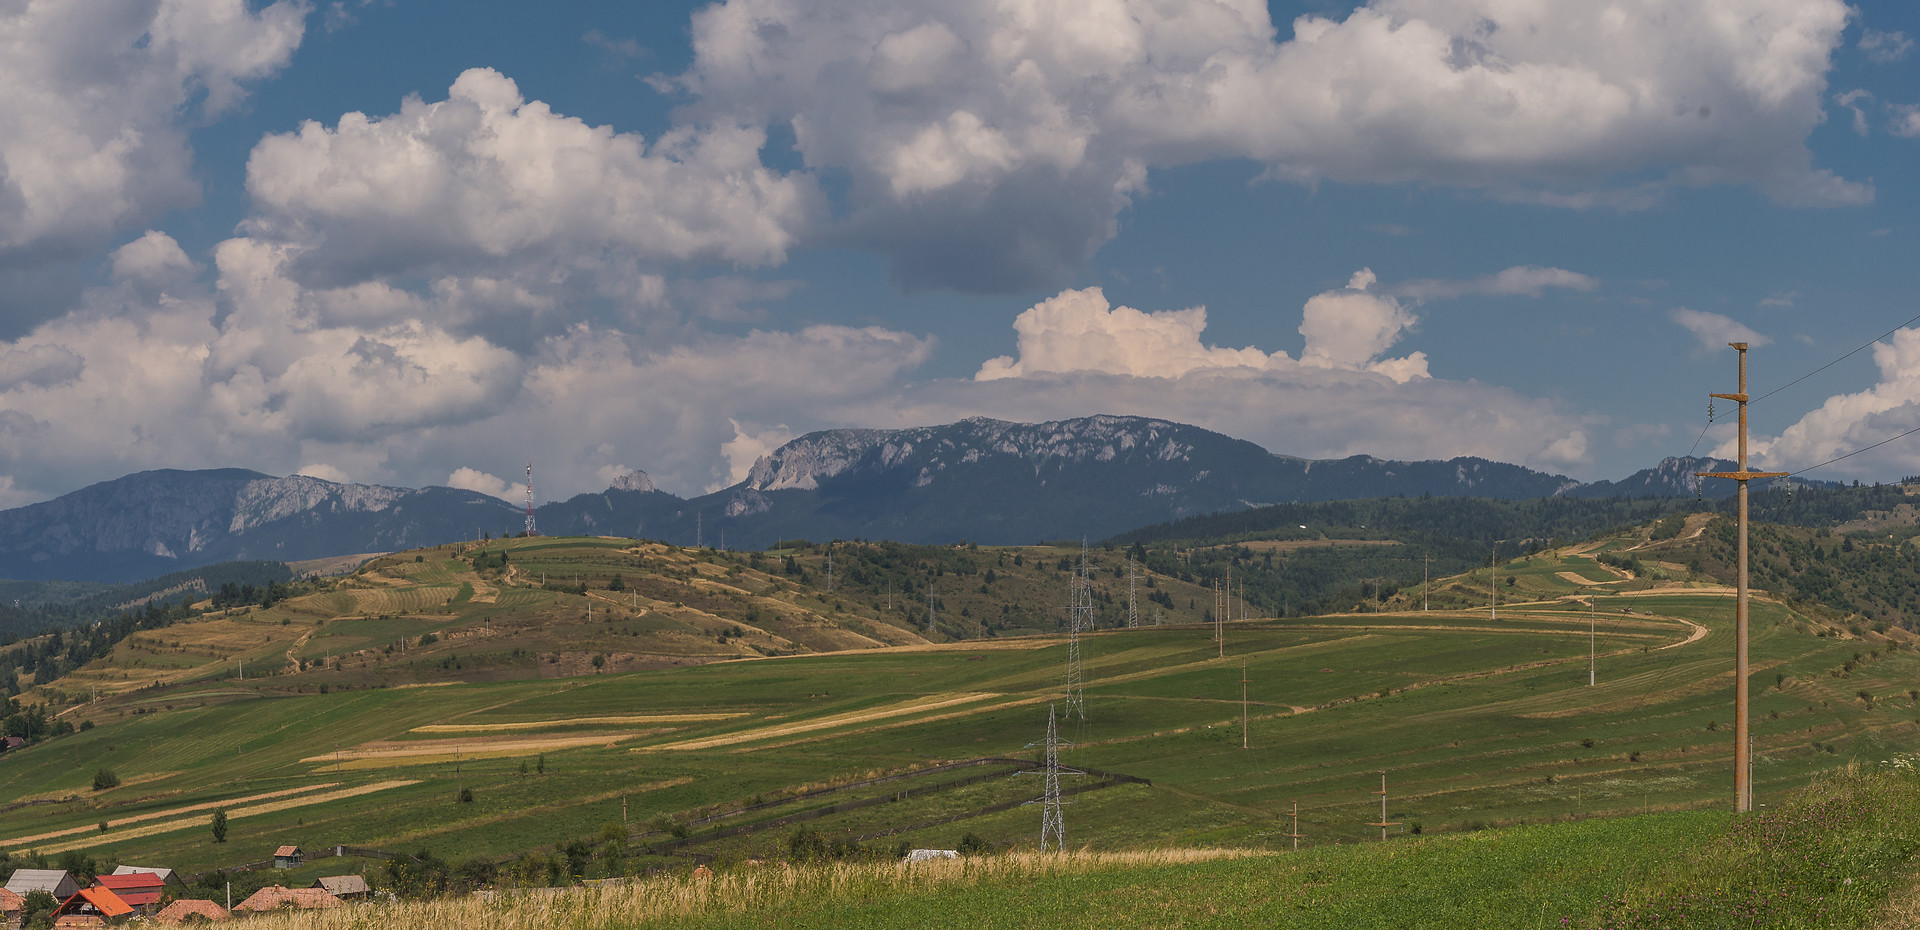 Csíkszentdomokos / Sândominic Harghita county / Hargita megye / Județul Harghita Romania / Románia / România 2017